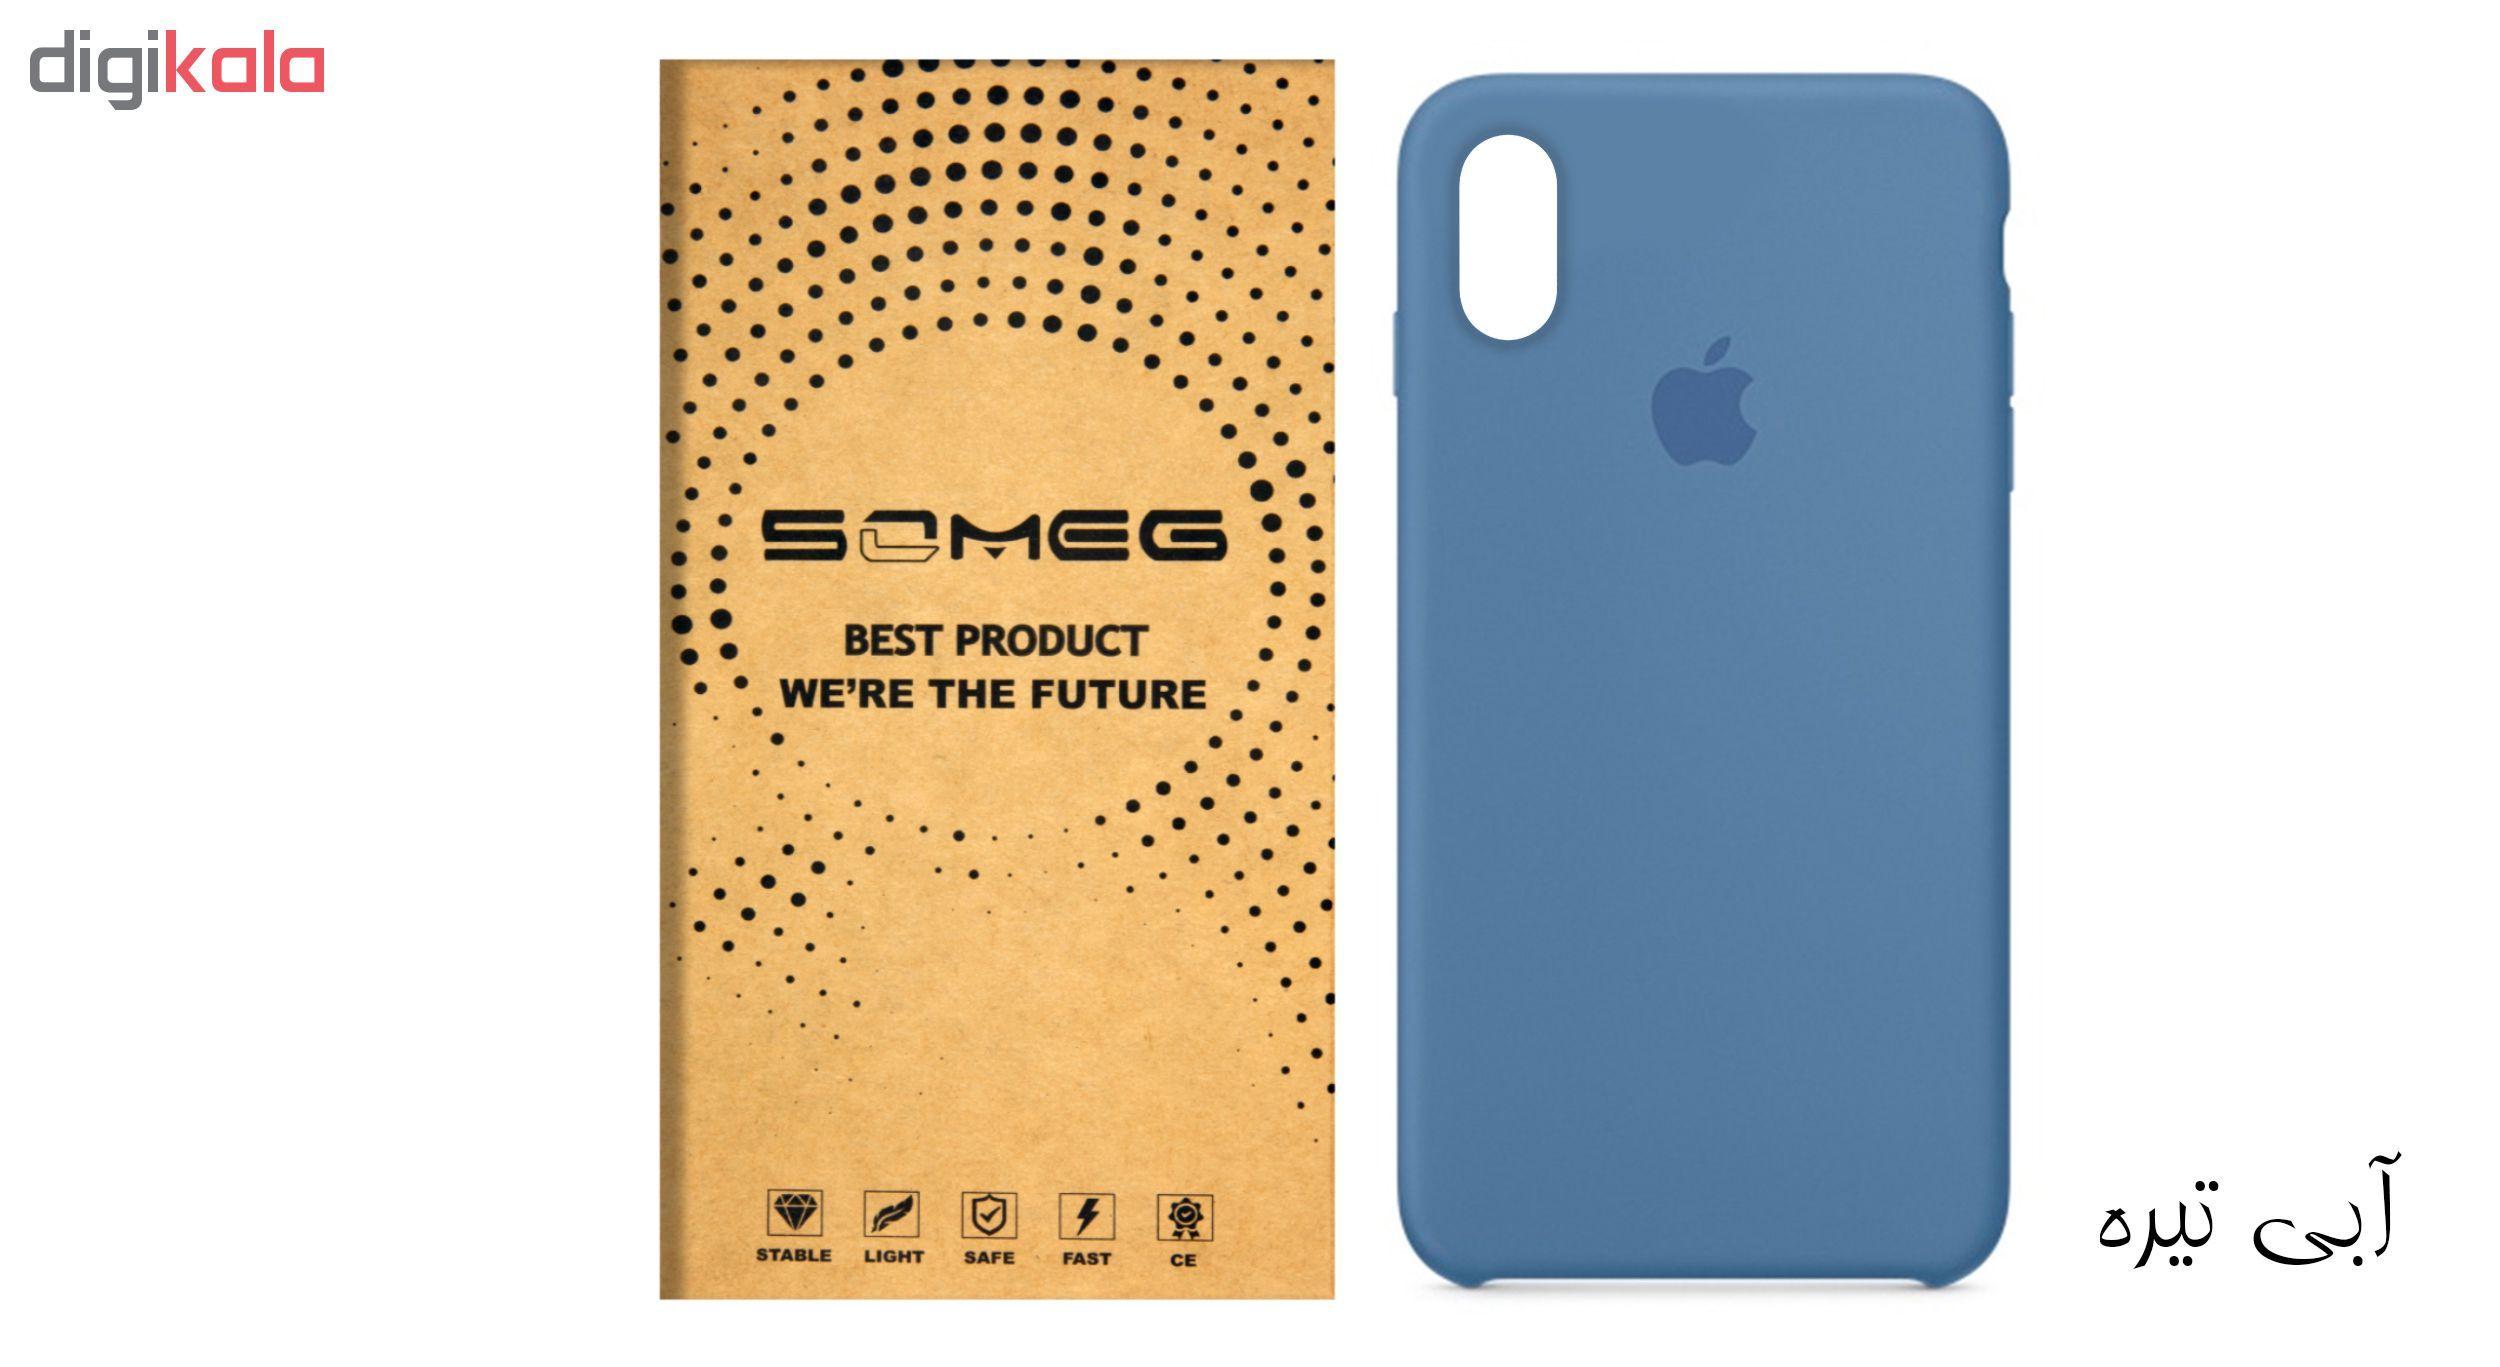 کاور سومگ مدل SIC مناسب برای گوشی موبایل اپل iPhone X  main 1 12